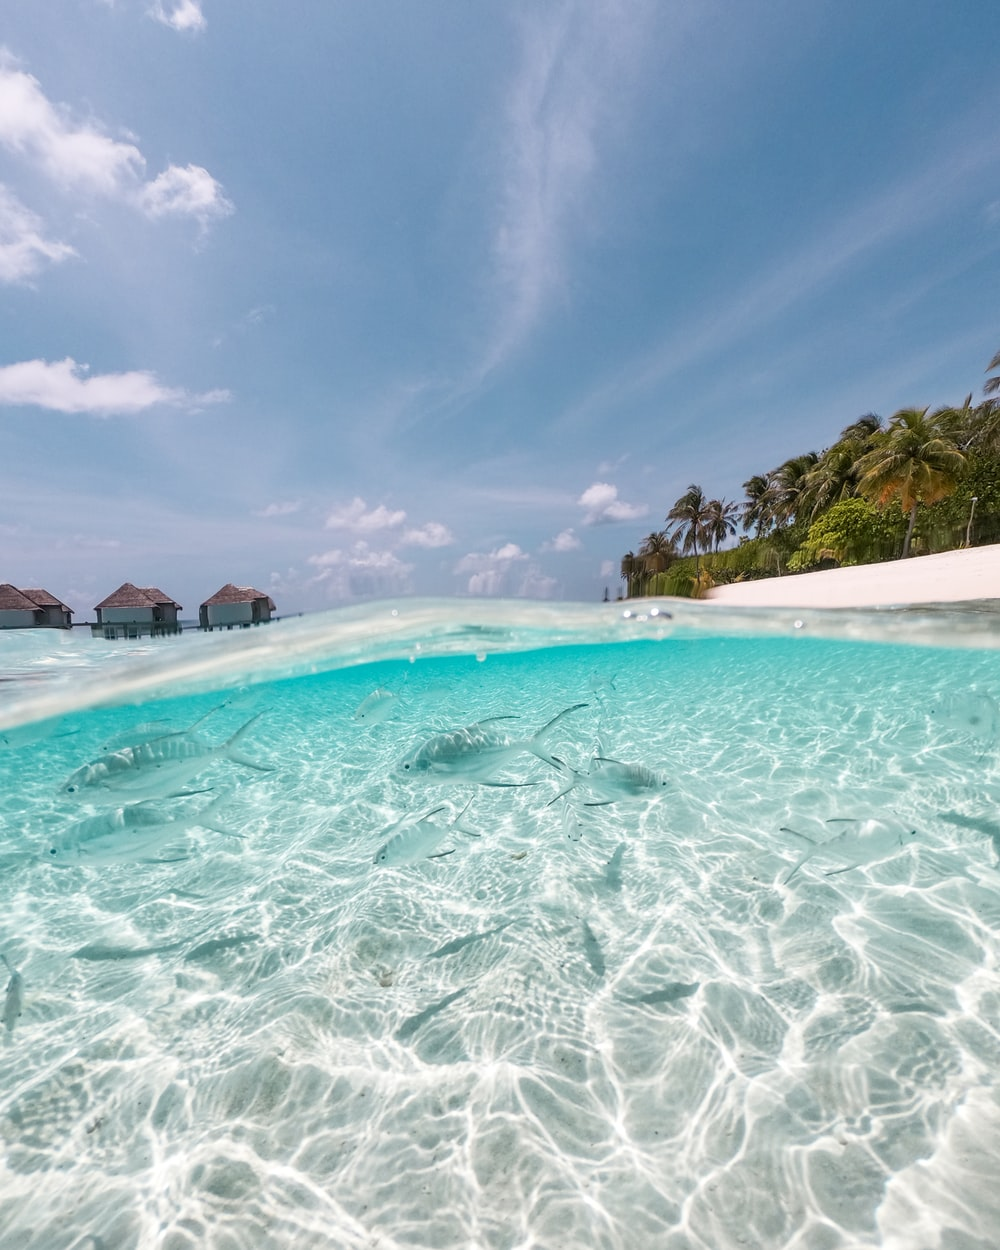 photo of body of water with nipa hut